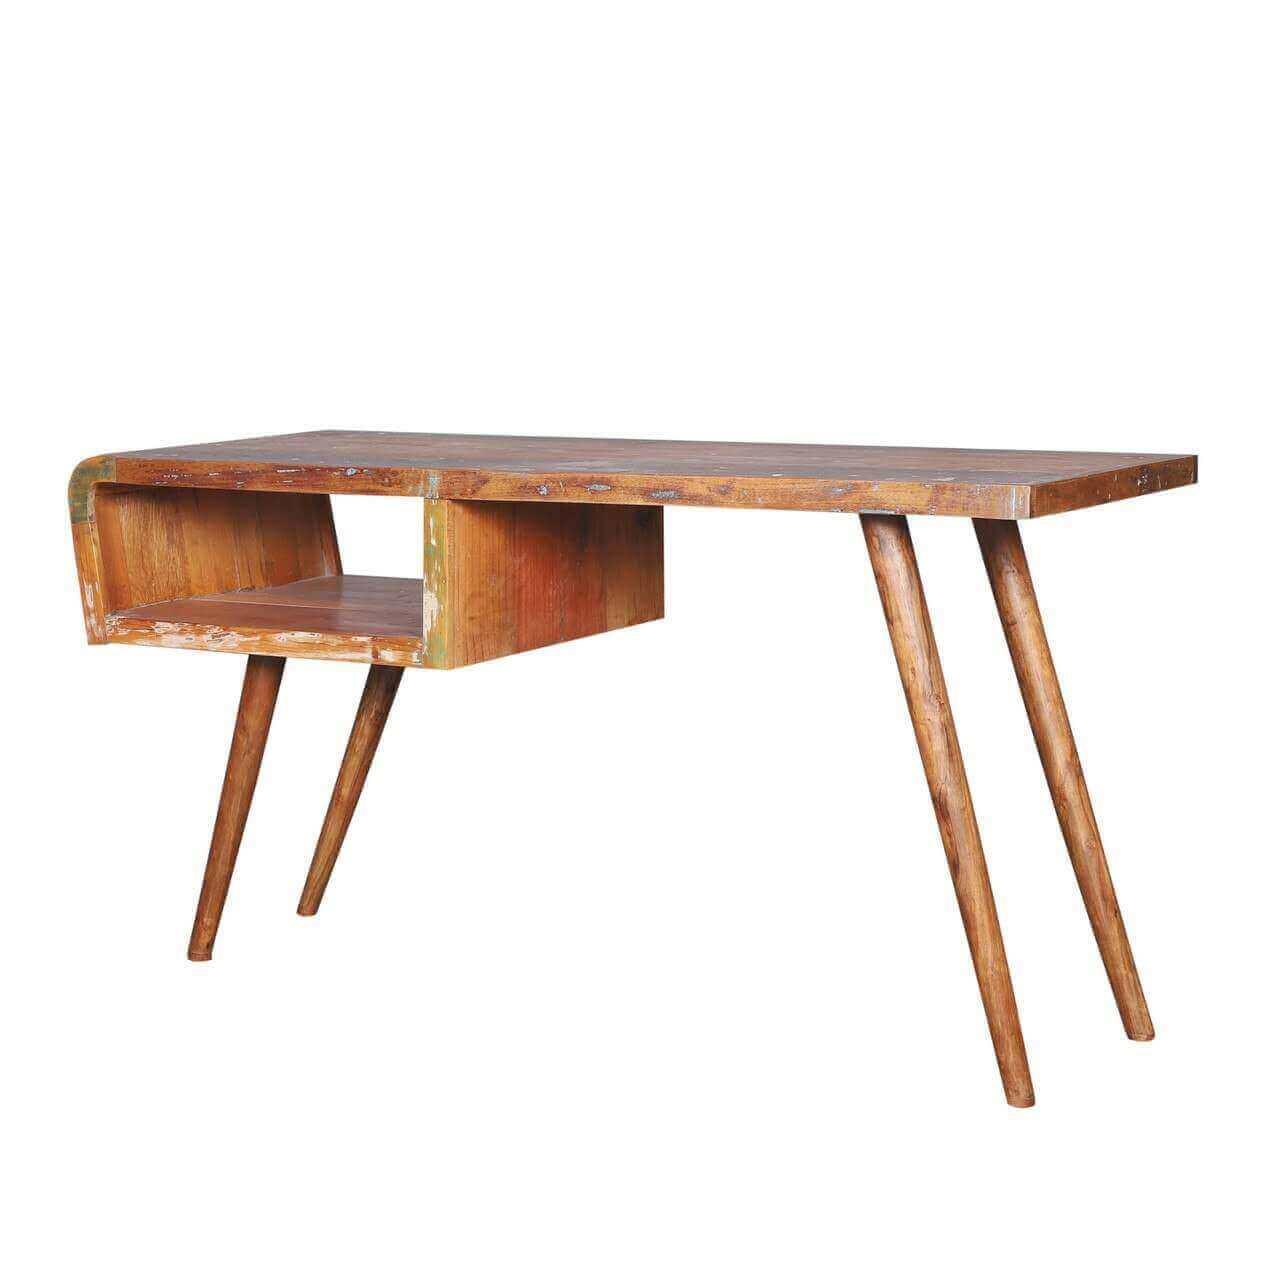 Peoa Rustic Reclaimed Wood Handcrafted Computer Desk